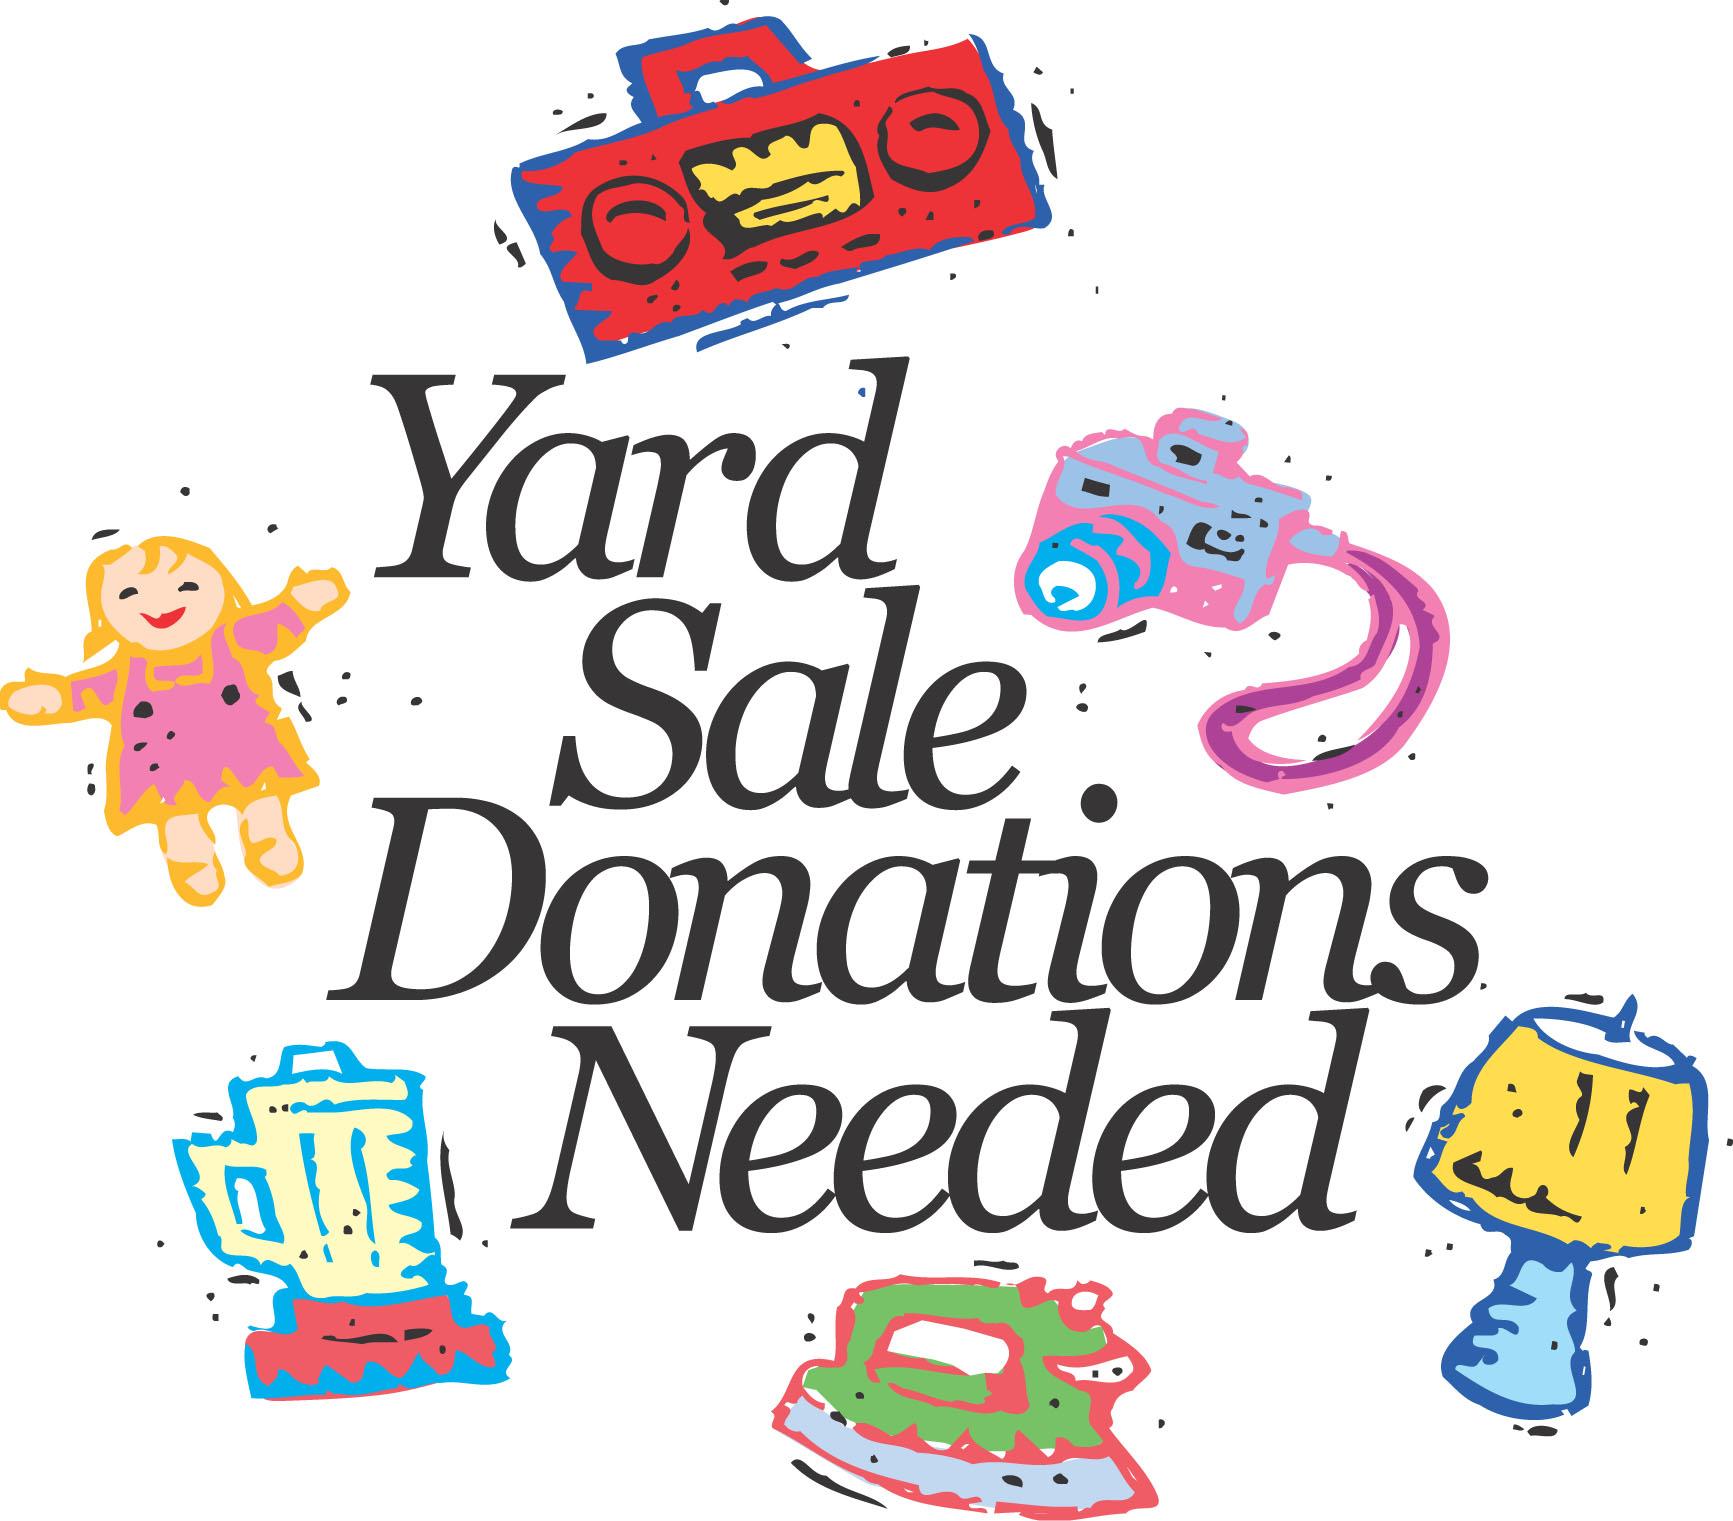 Auction clipart church. Yard sale garage clipartix